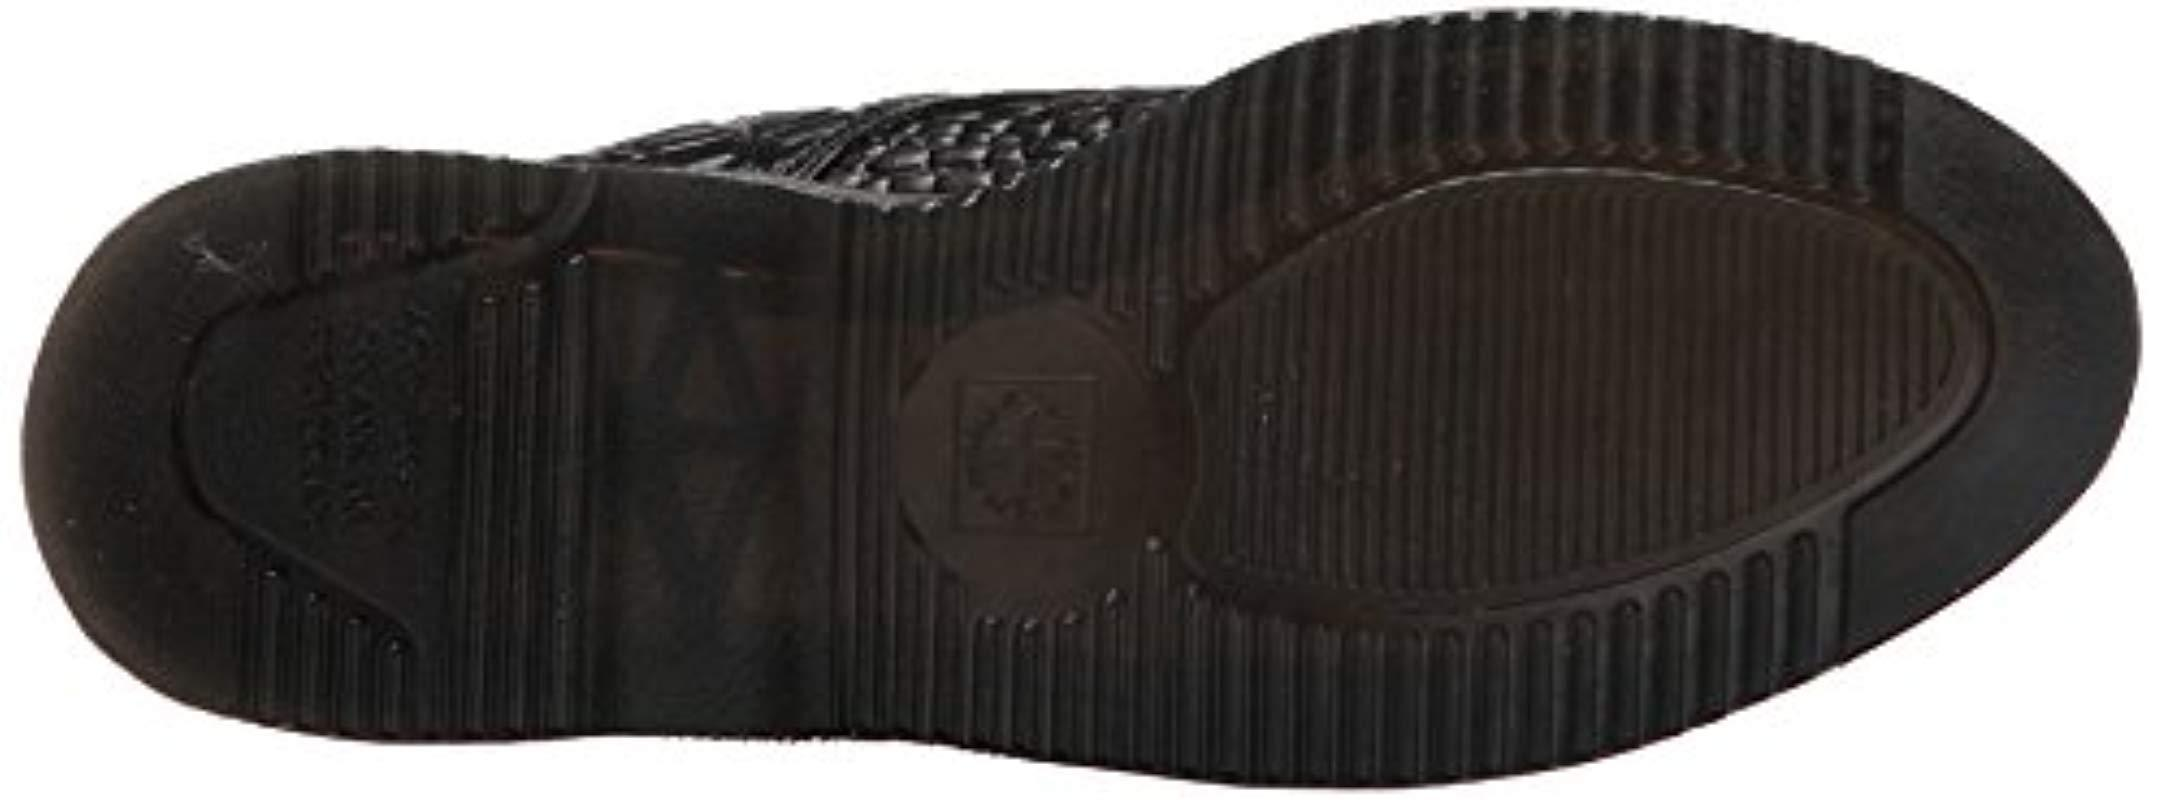 Martens Womens Emmeline Croc Fashion Boot Dr